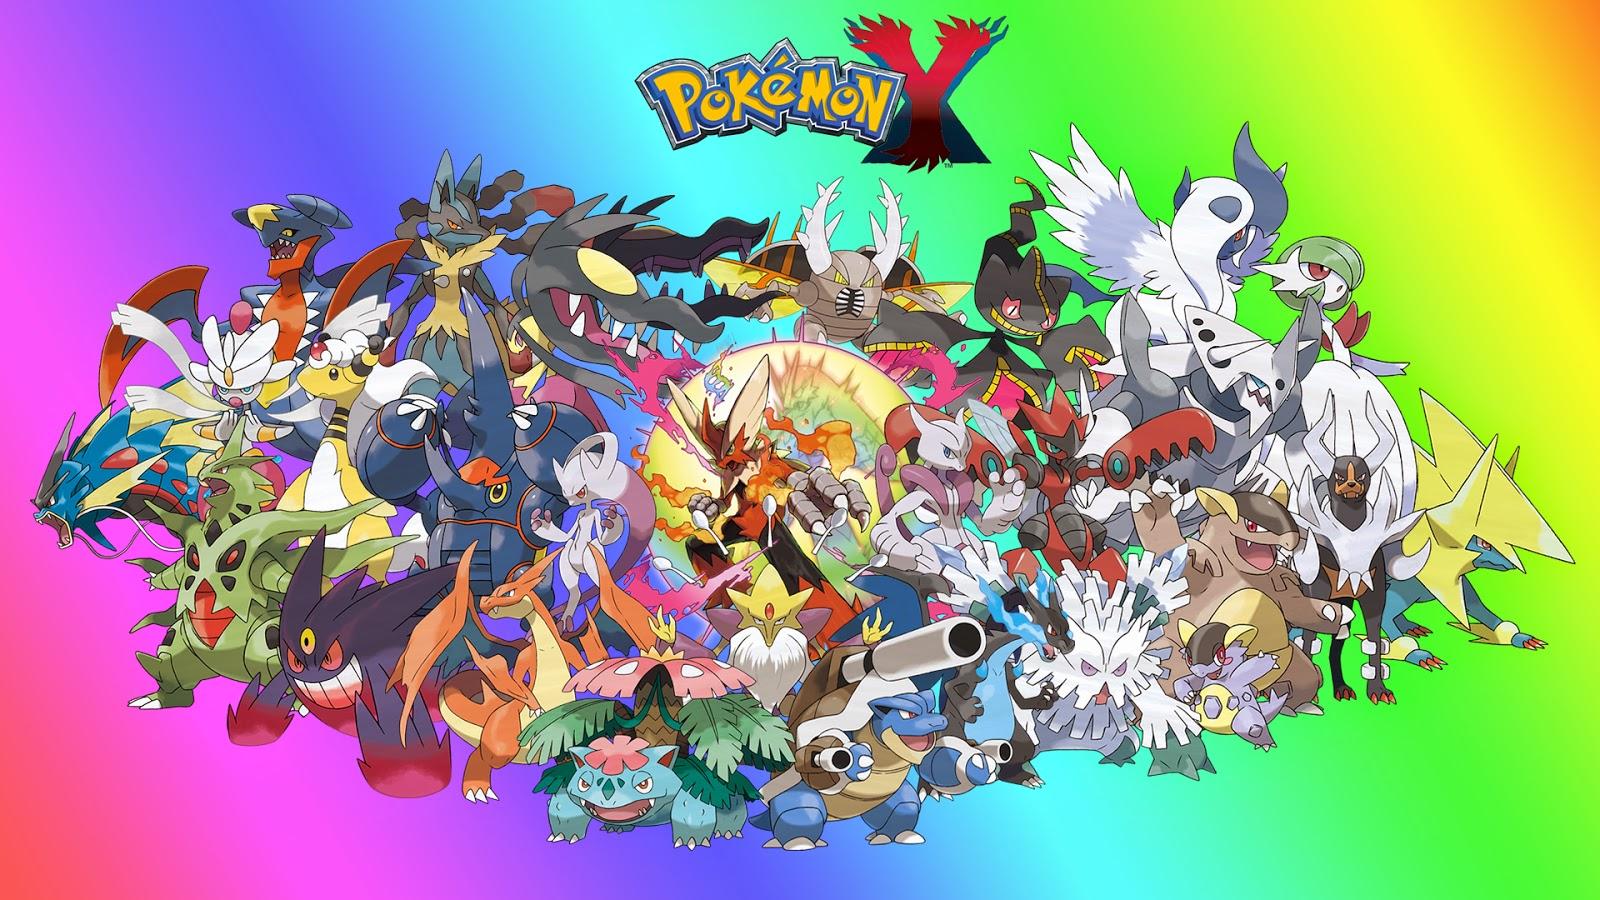 nave bebop pokemon cronologia dos jogos